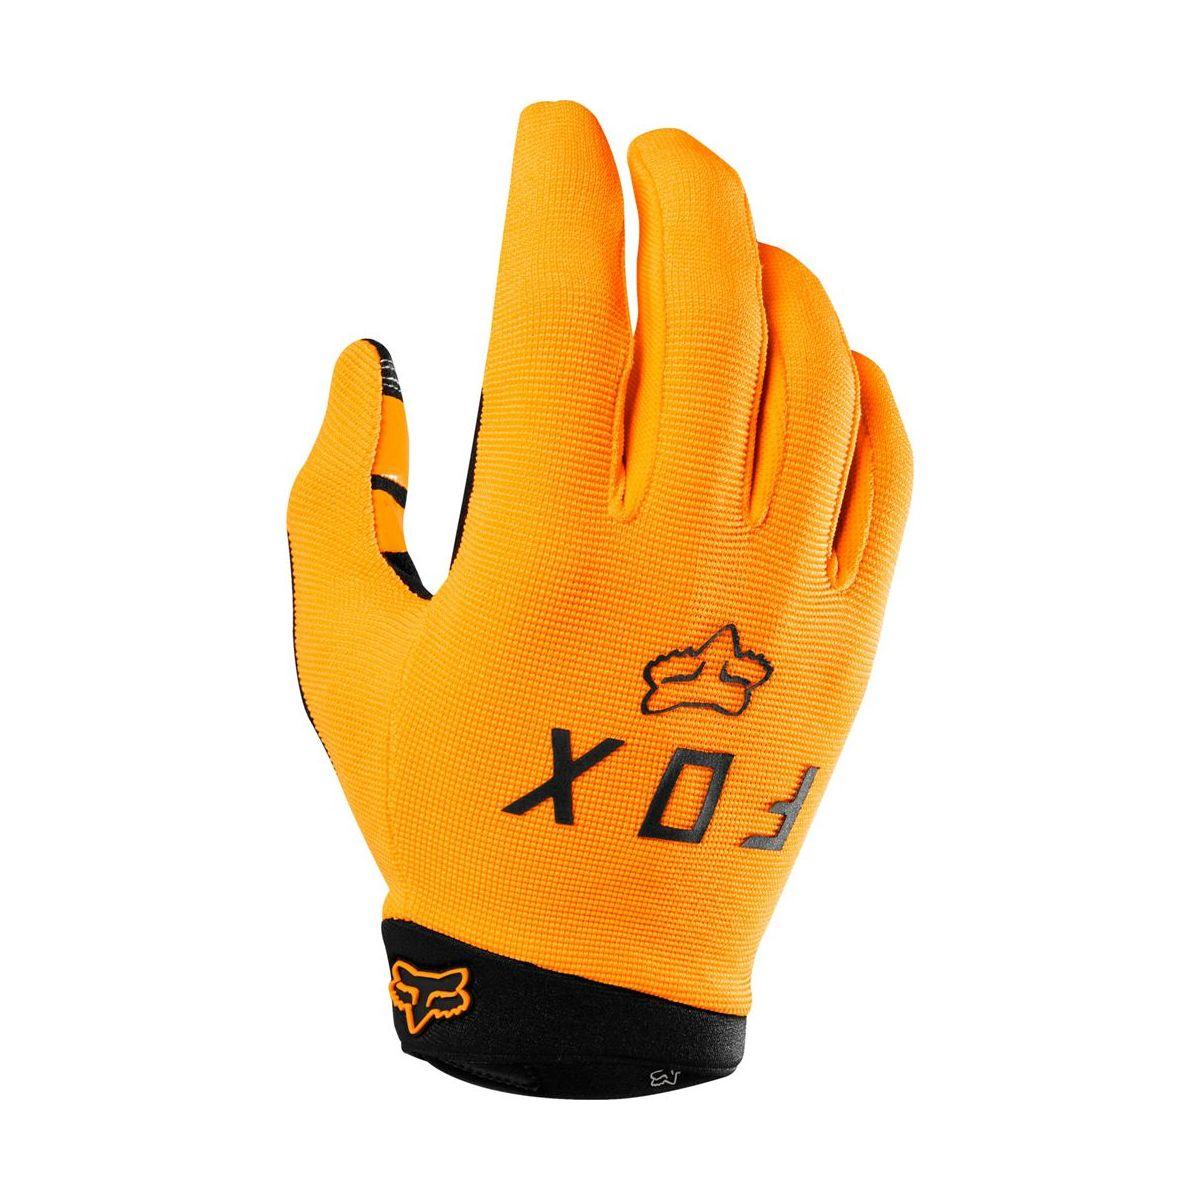 Rękawiczki Fox Ranger Atomic Orange